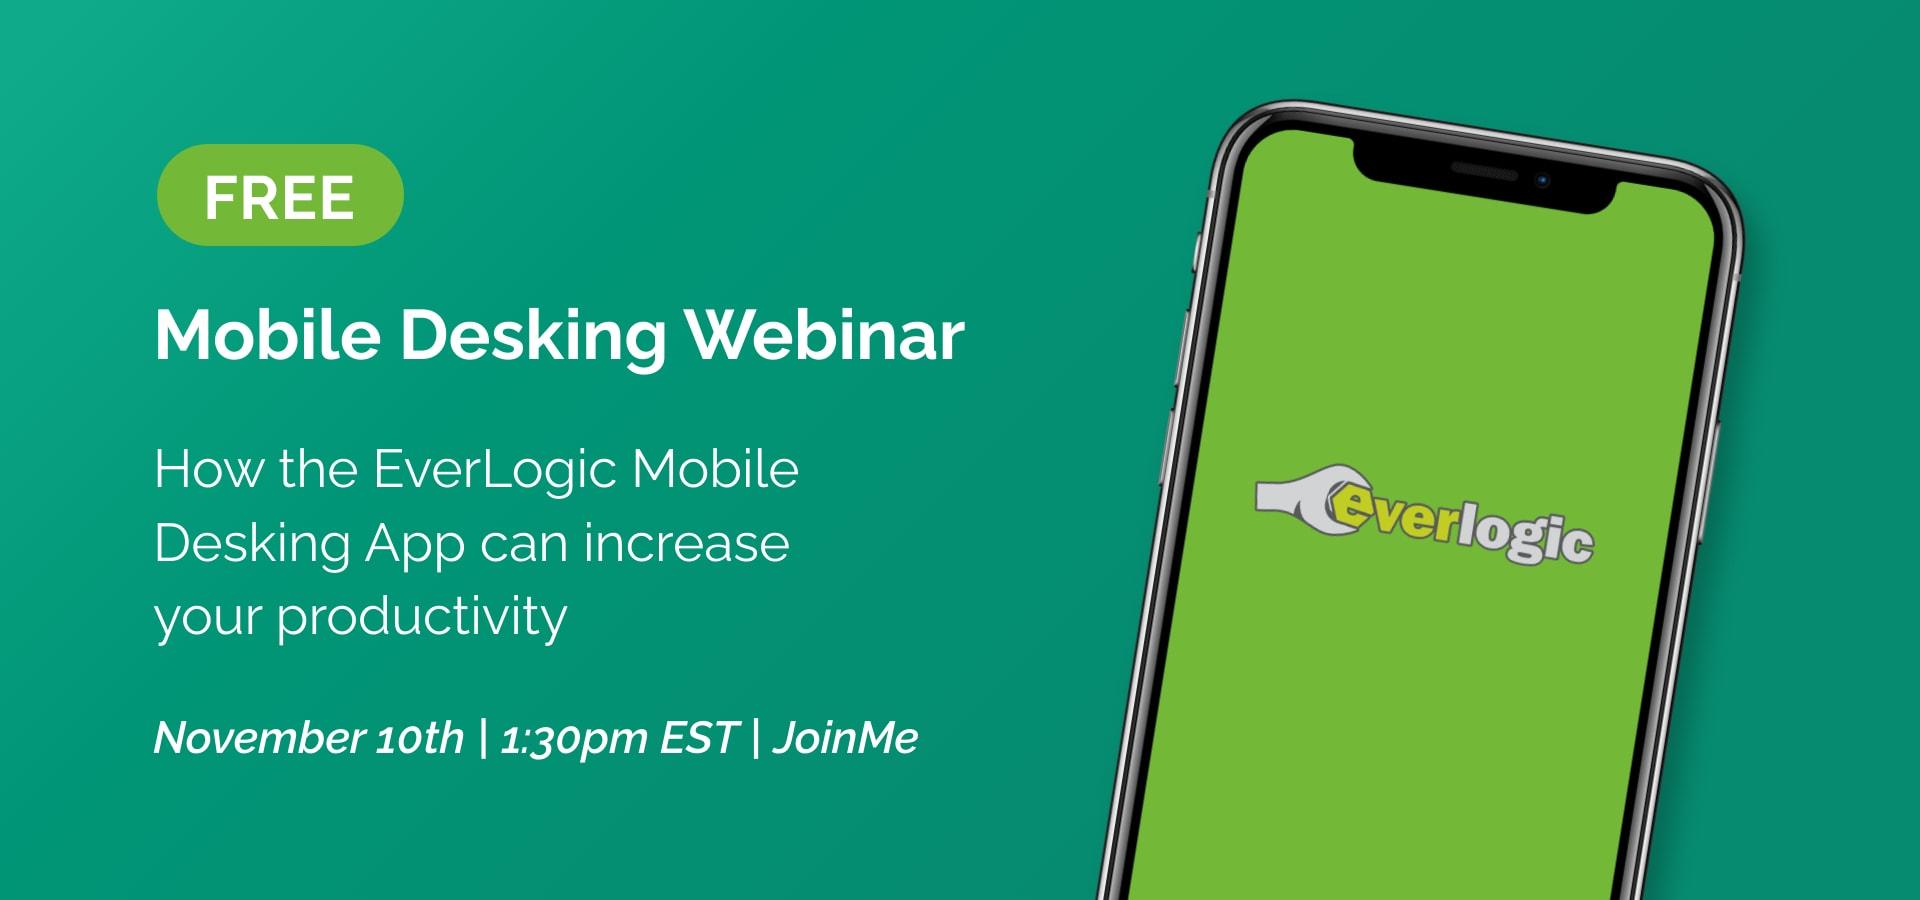 Free Mobile Desking Webinar November 10th